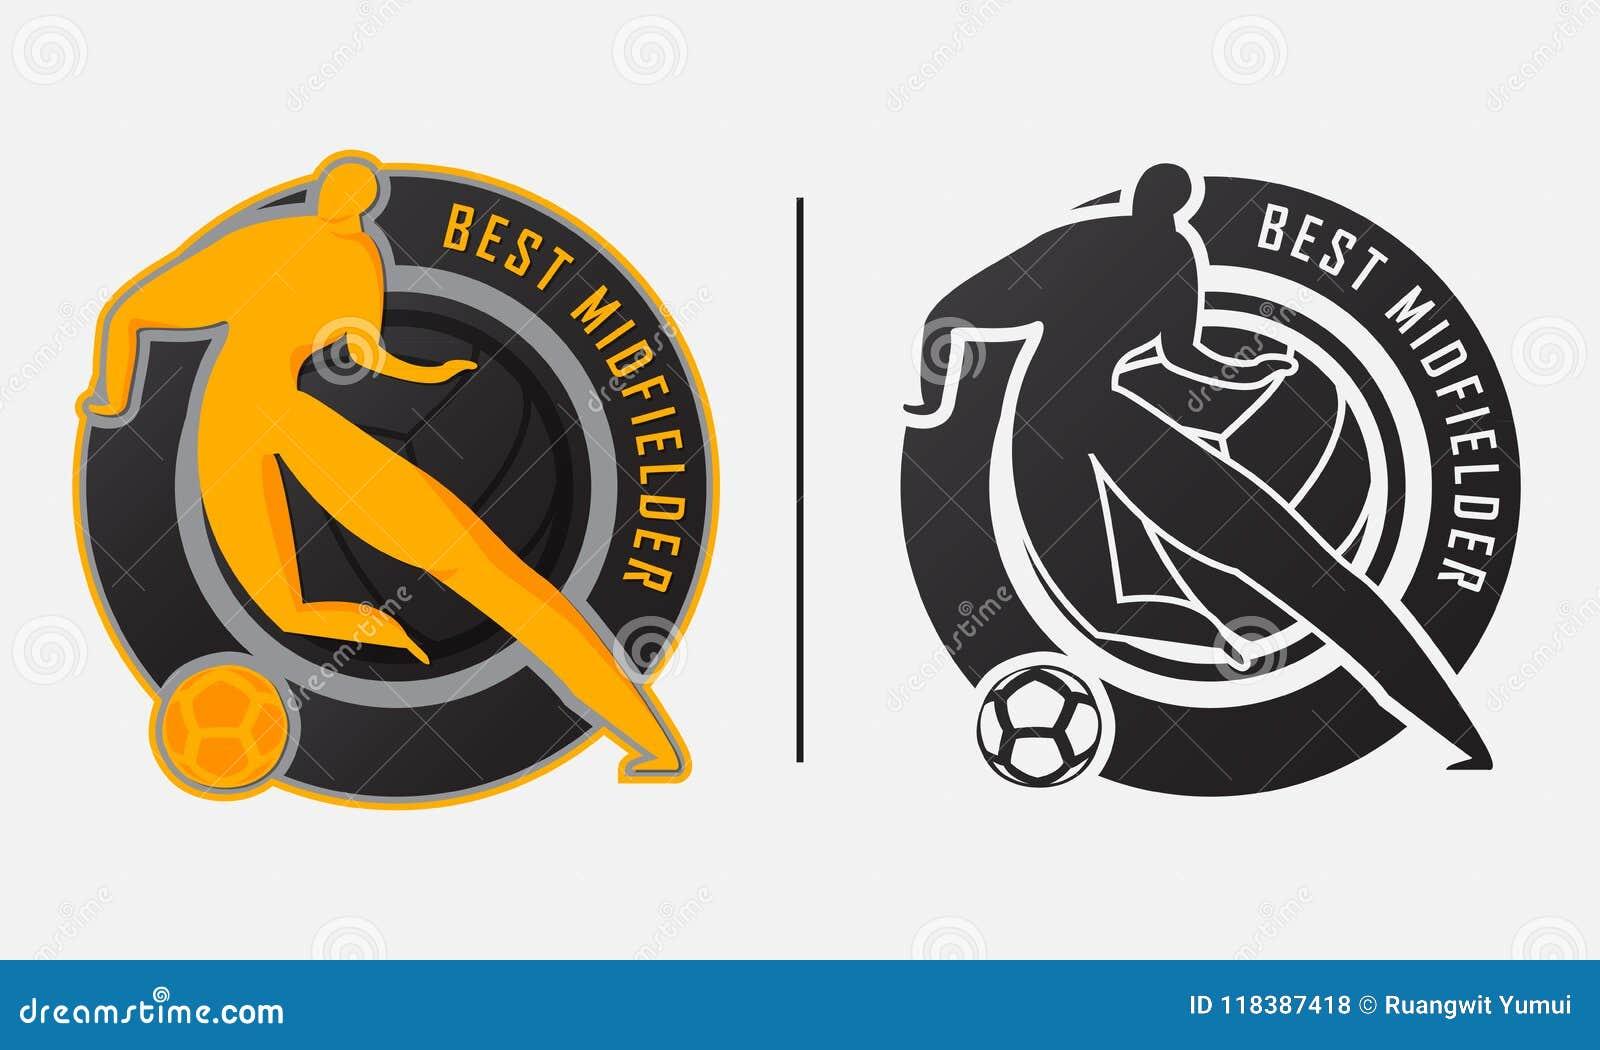 Best Midfielder Trophy Best Soccer Player Or Football Player Award